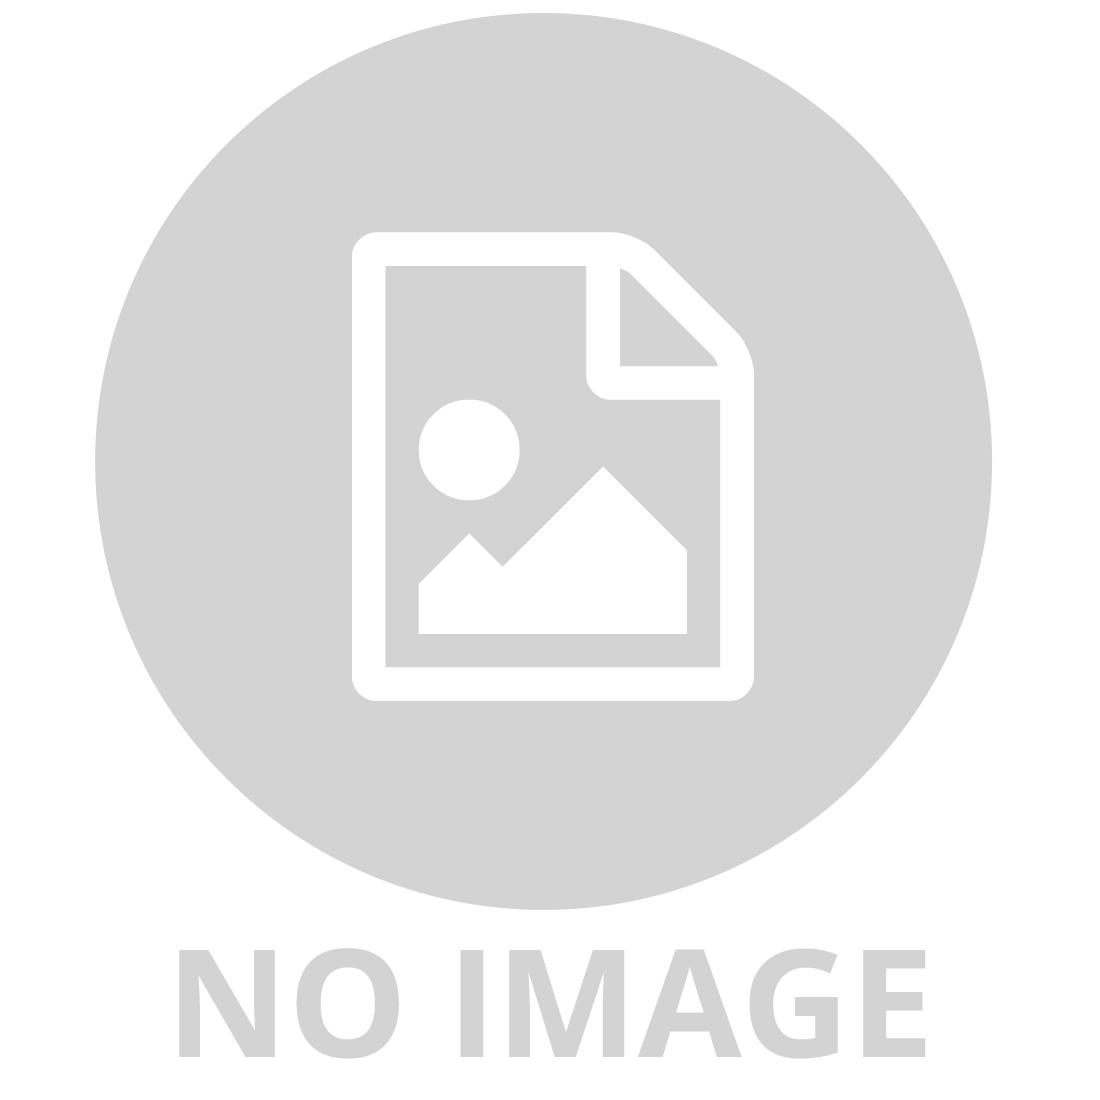 ACADEMY 1/48 USAAF P 51B BLUE NOSE